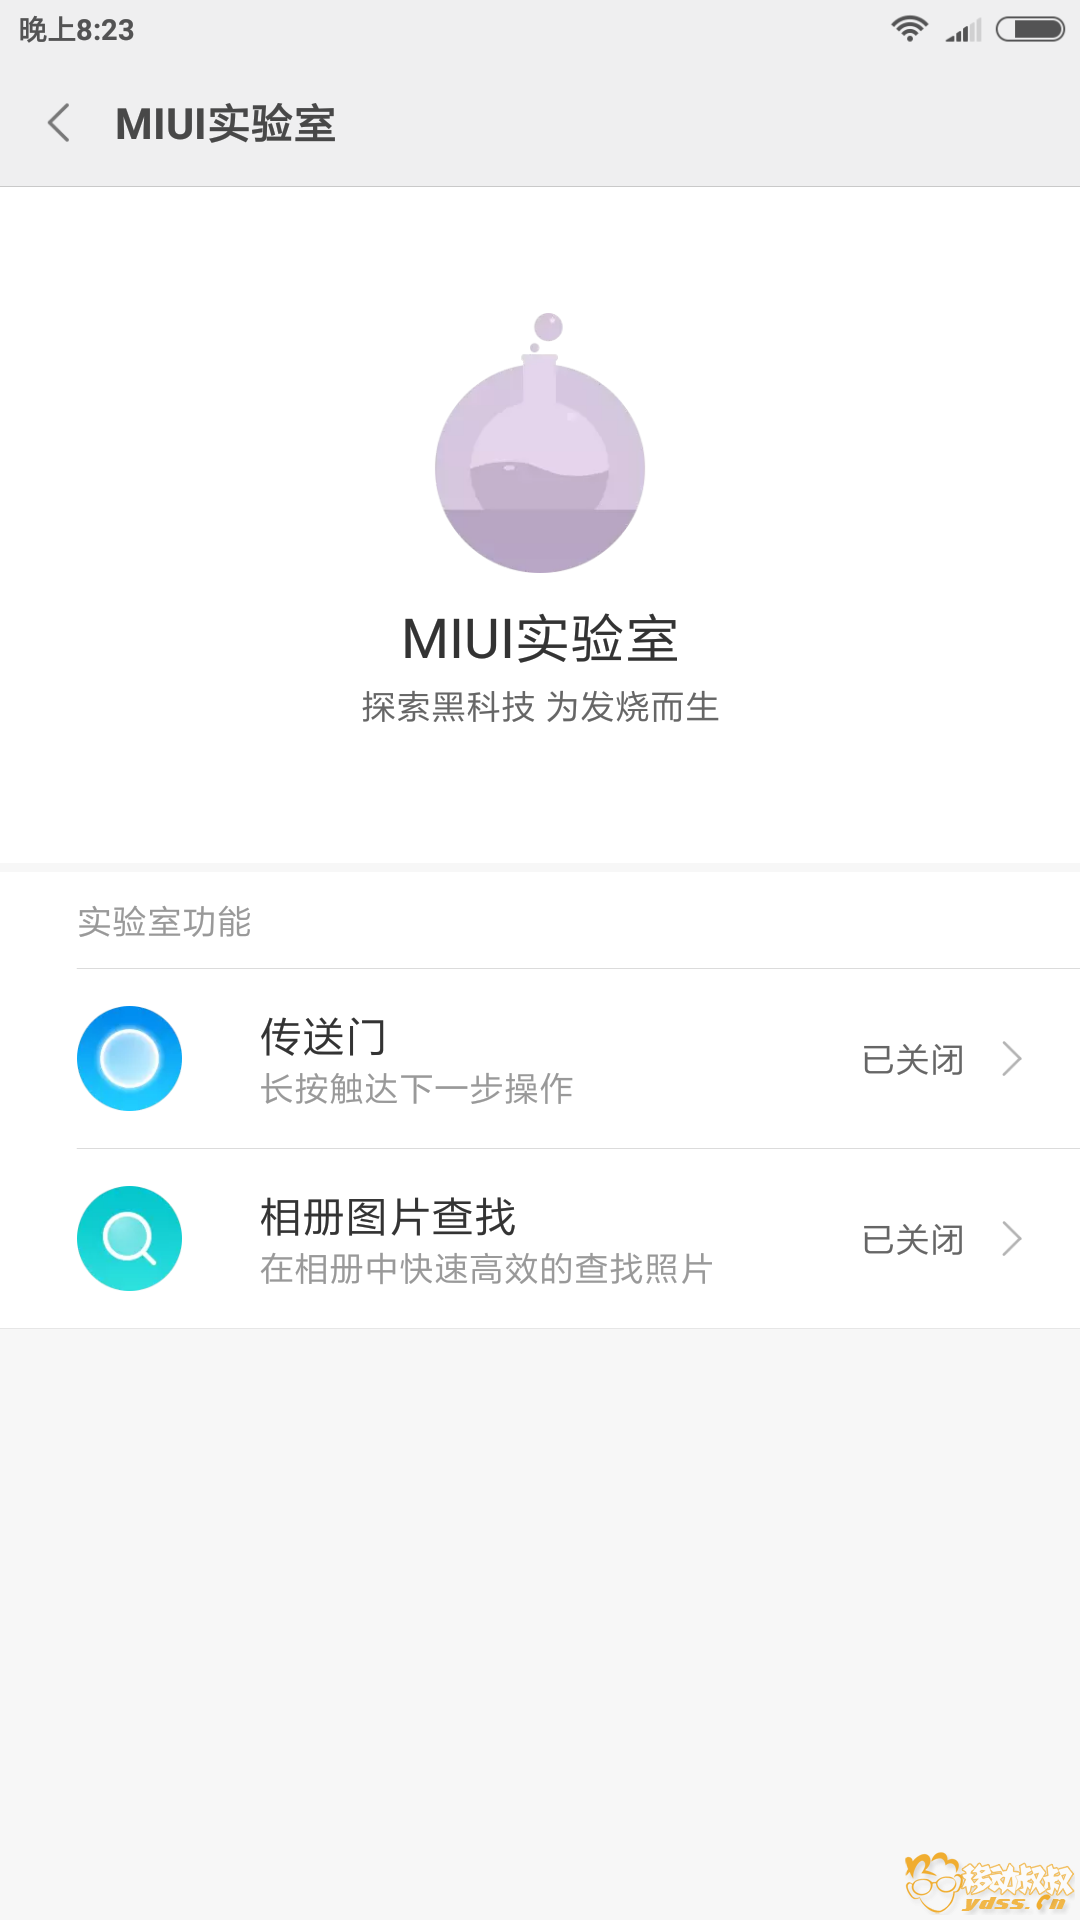 Screenshot_2018-02-28-20-23-39-551_com.android.settings.png